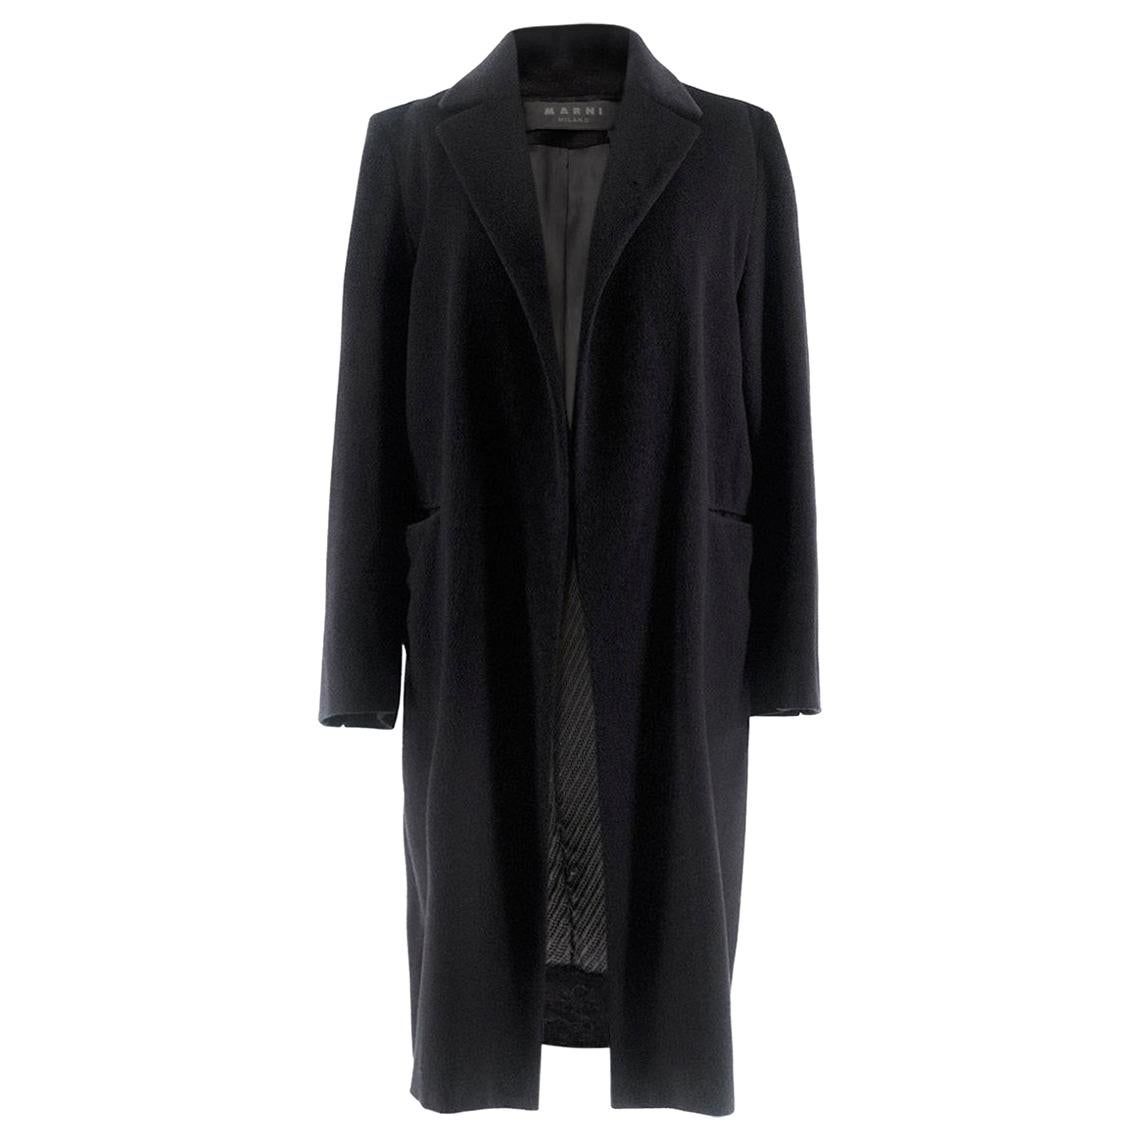 Marni Black Long Wool Coat US 6